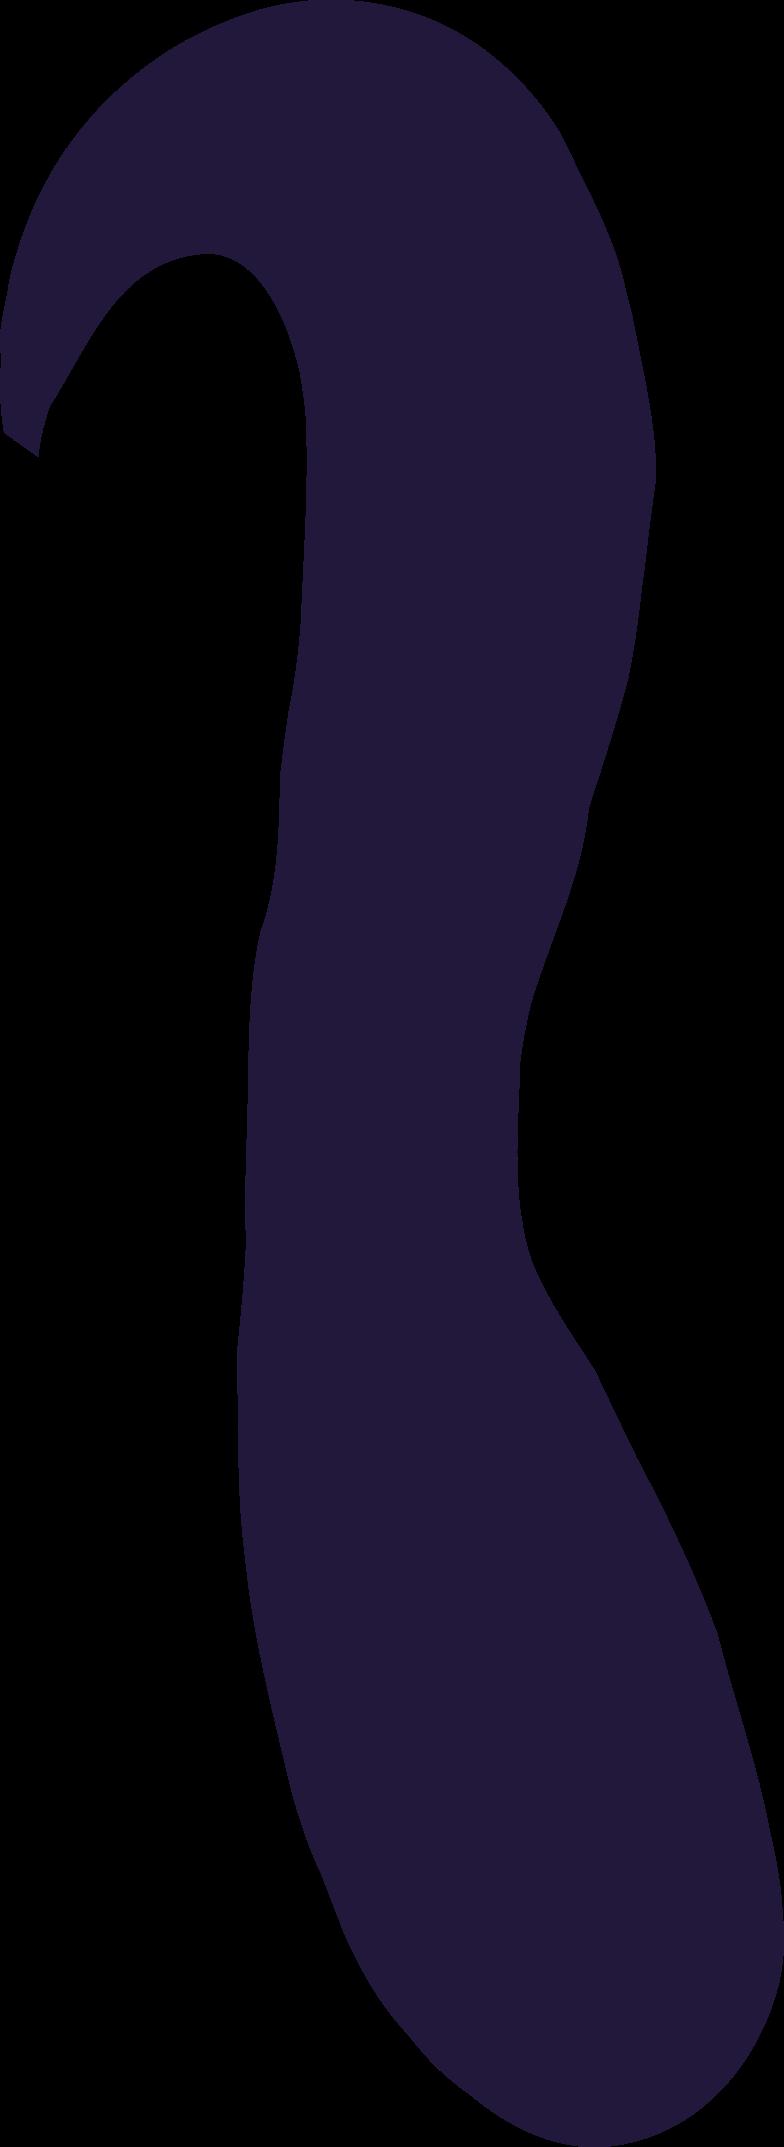 order complete  hair Clipart illustration in PNG, SVG